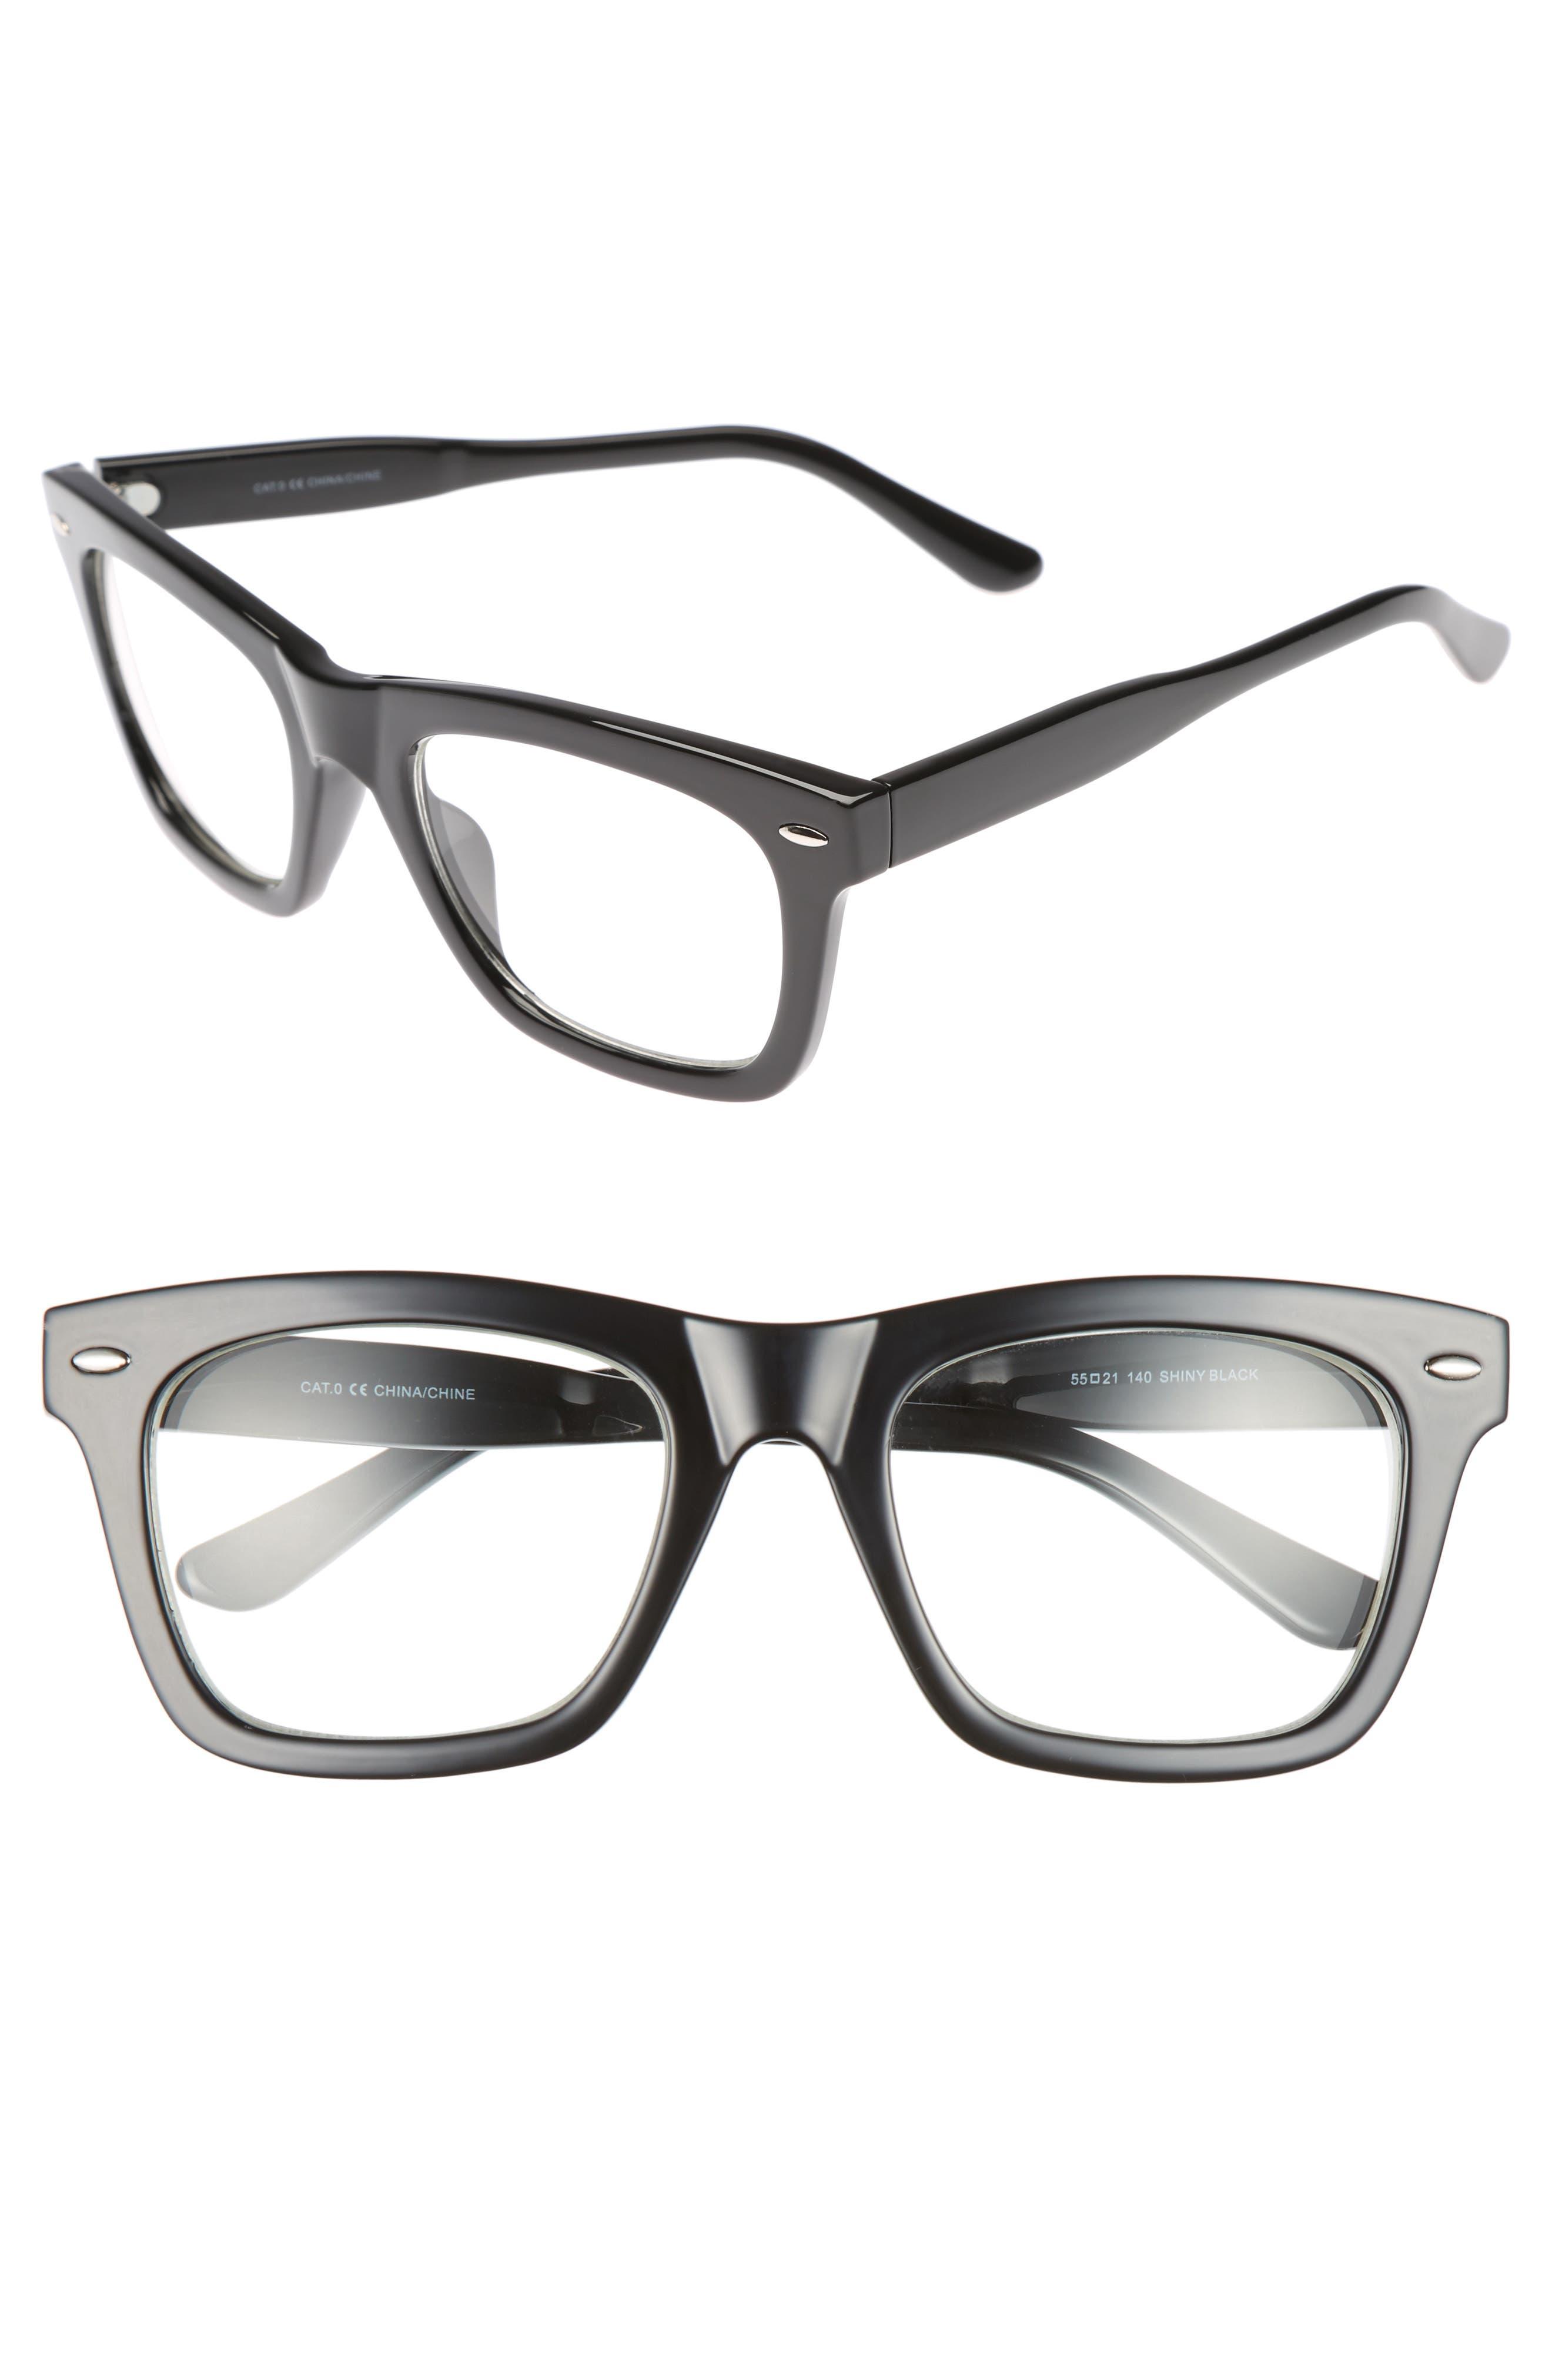 Julian 55mm Square Sunglasses,                             Main thumbnail 1, color,                             BLACK/ CLEAR